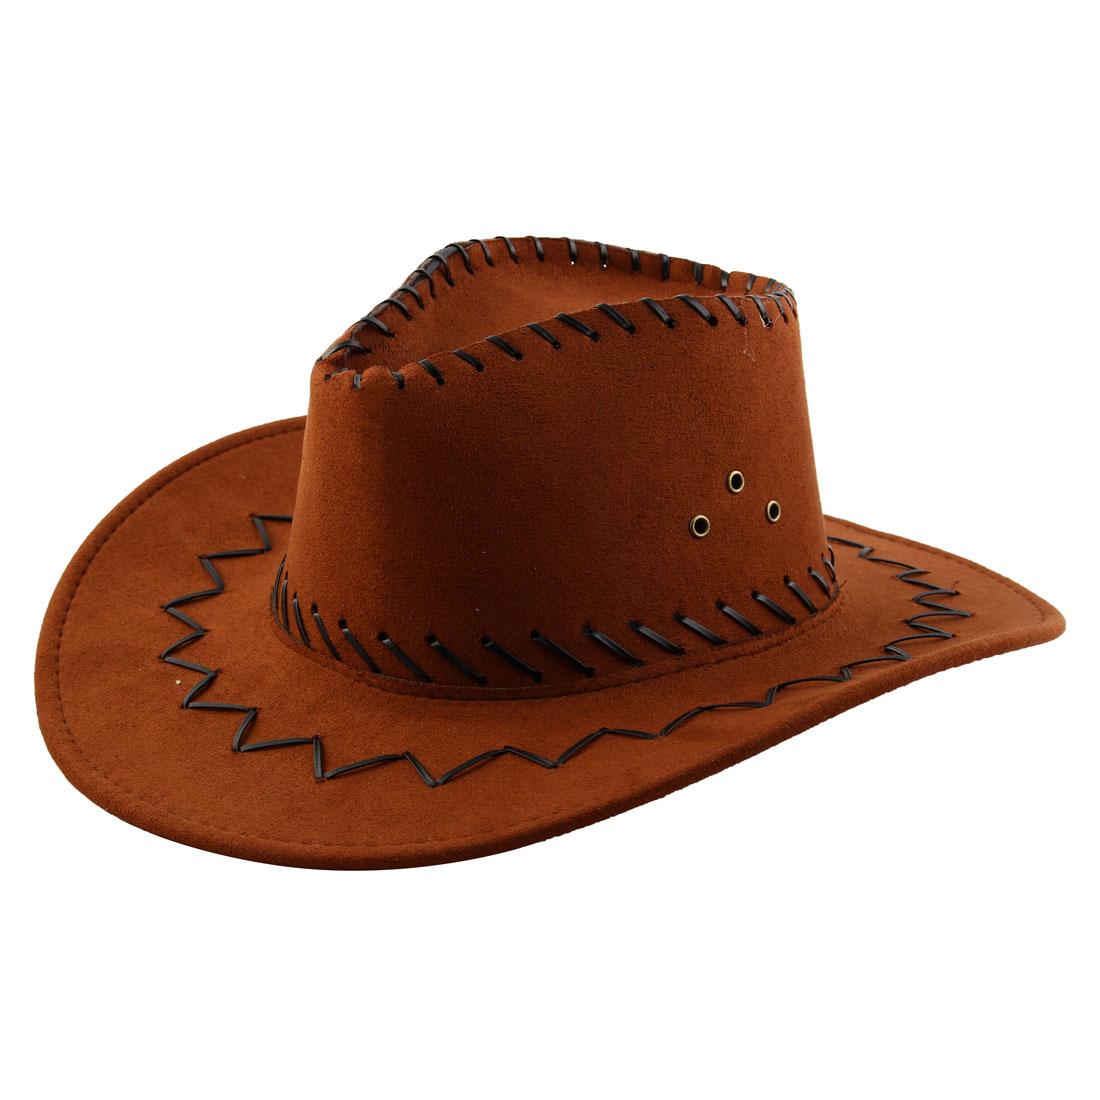 Adult Adjustable Neck Strap Wide Brim Western Style Sunhat Cowboy Hat Brown